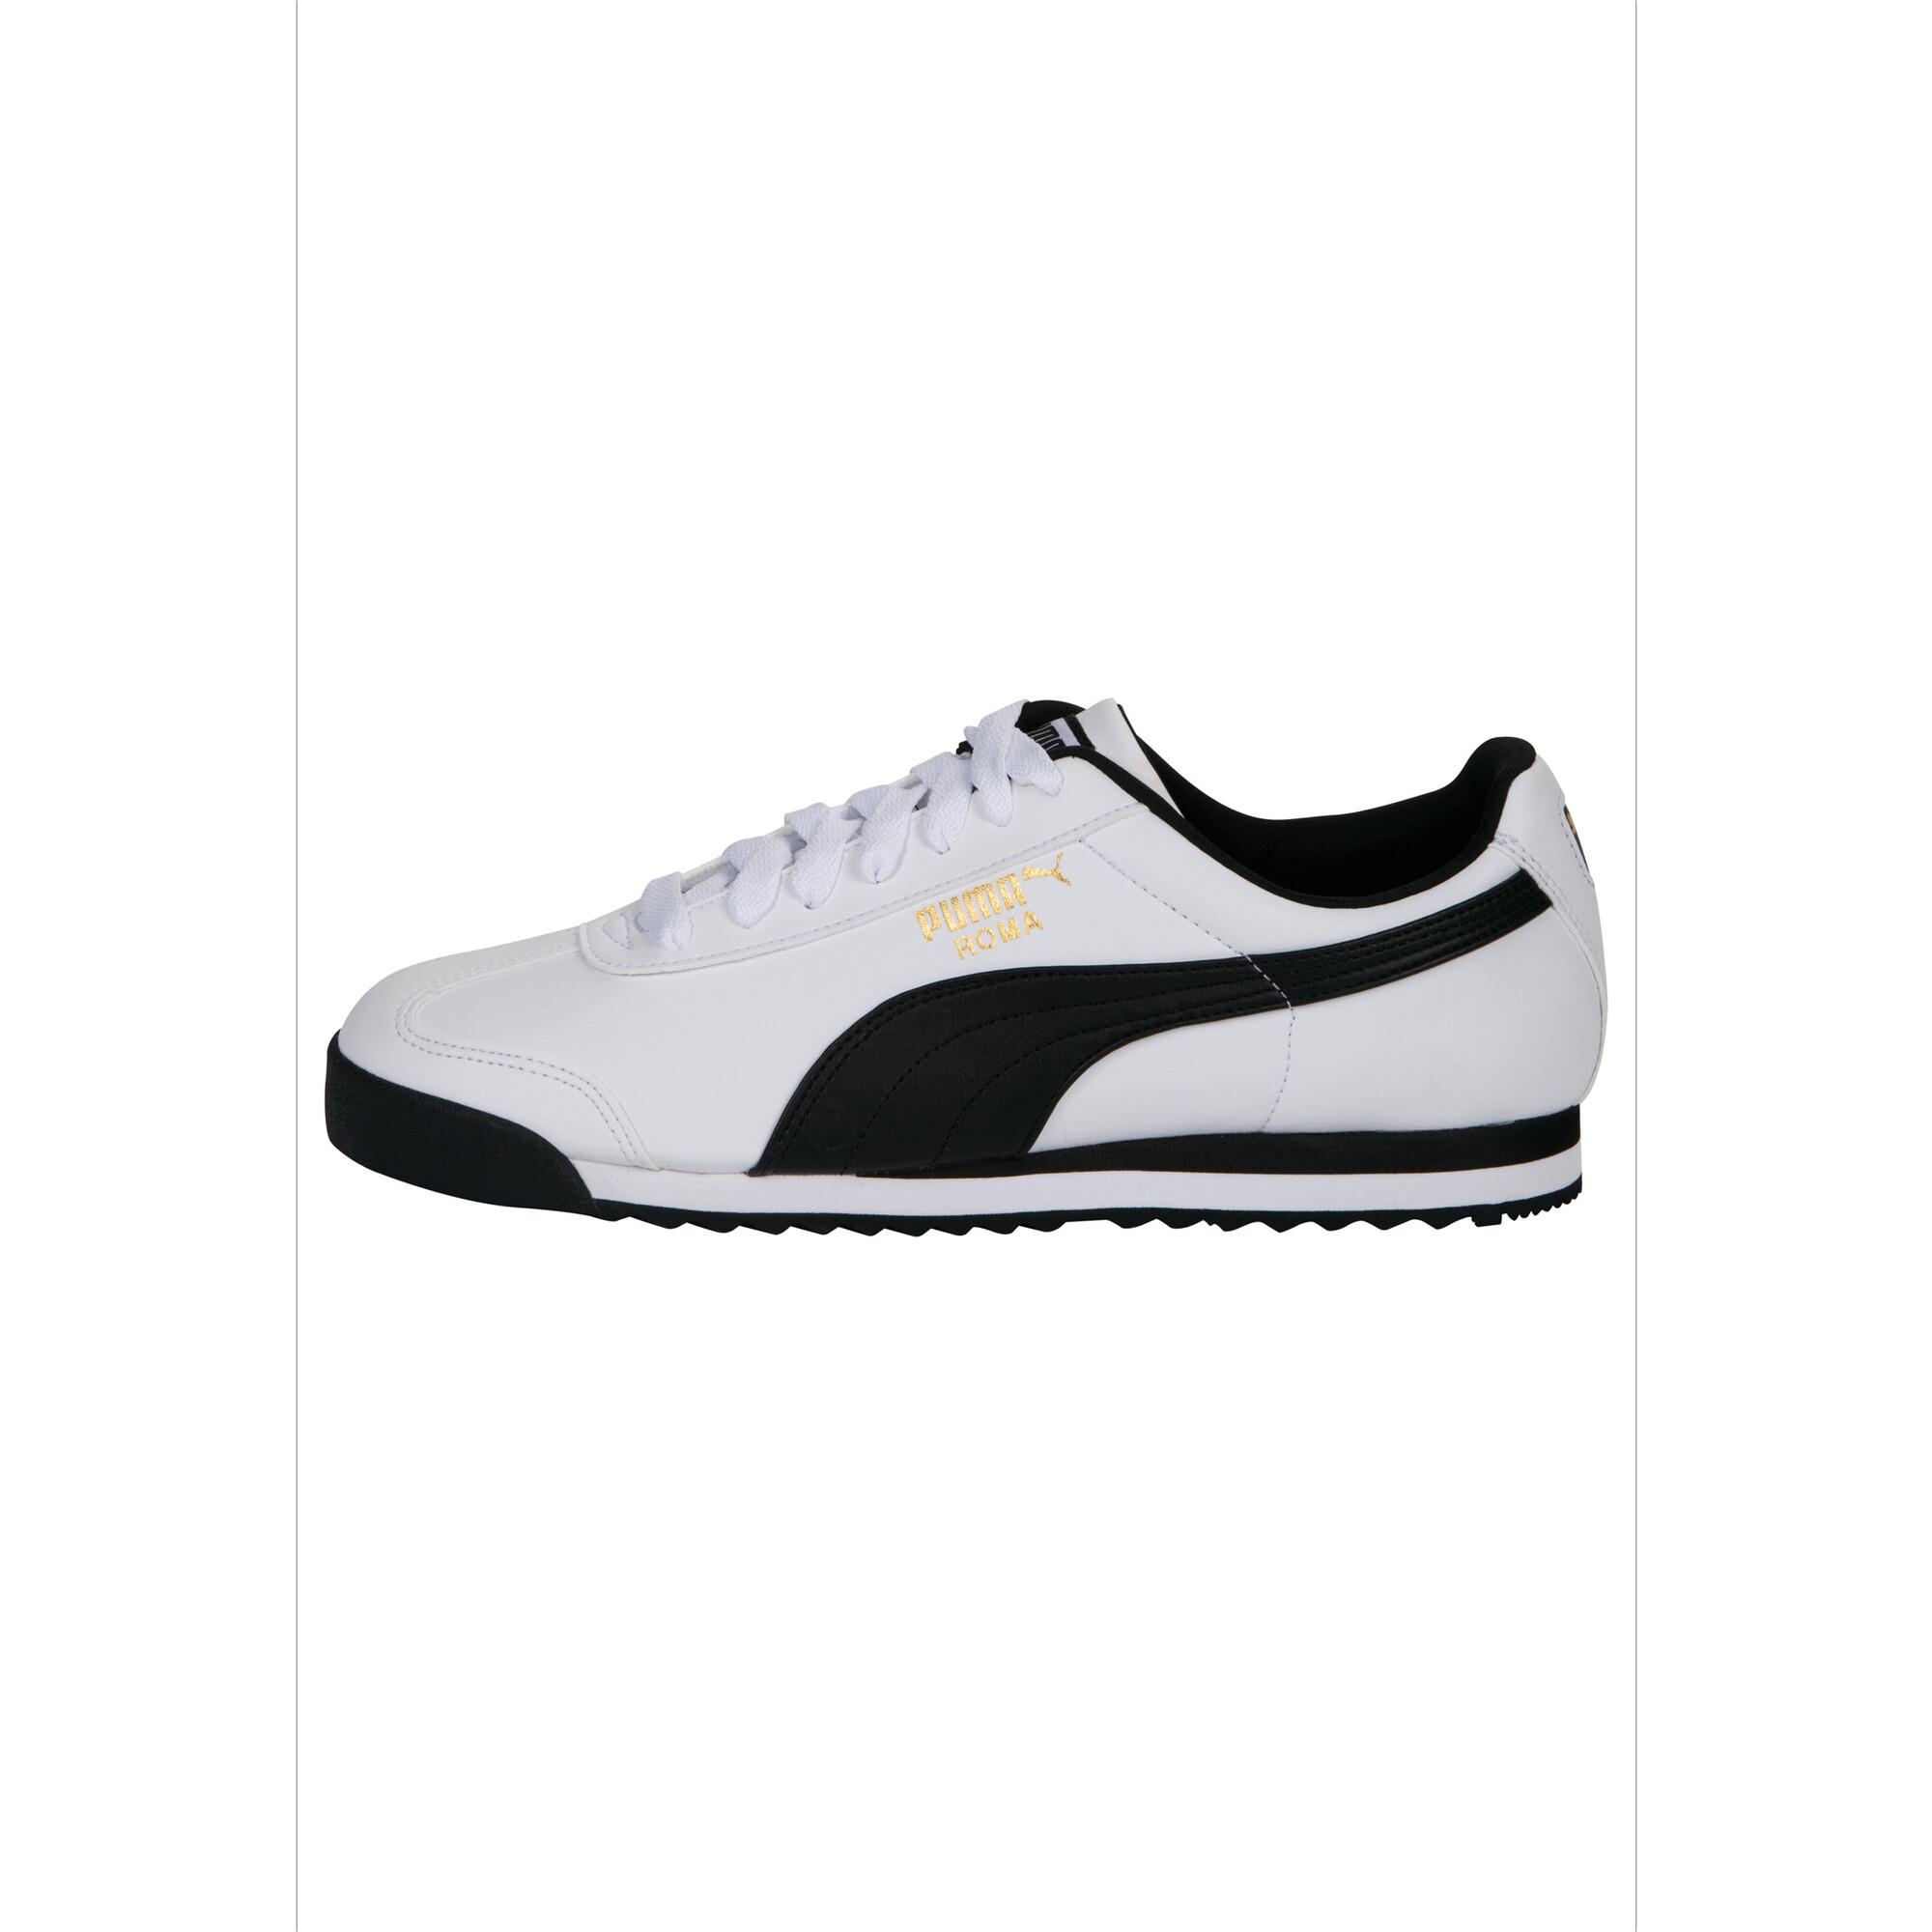 miniature 10 - Puma Men's Roma Basic Sneakers